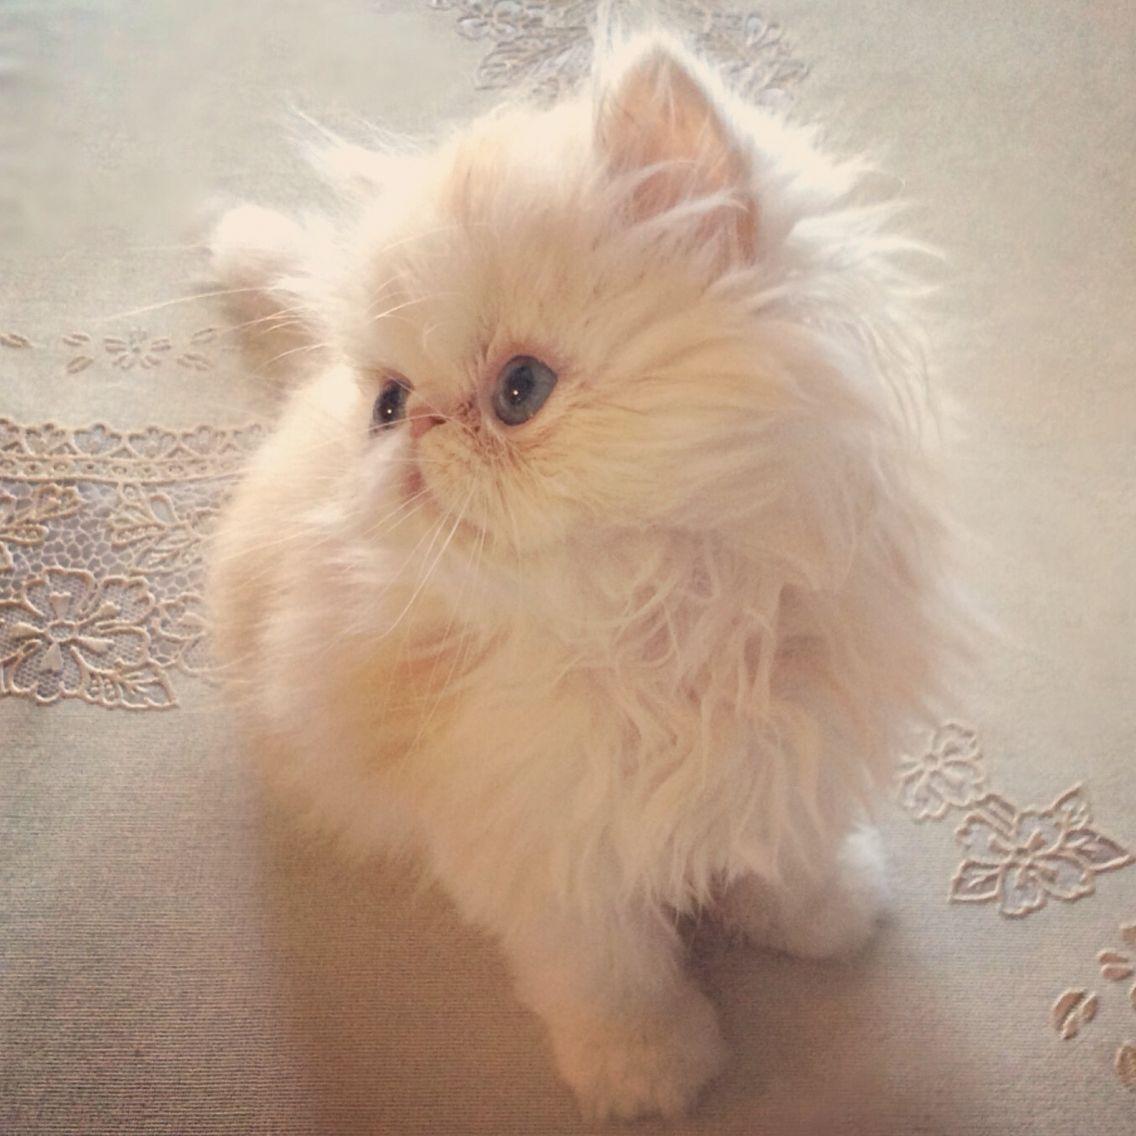 Oliver Is 8 Weeks Persiankittens Kittens Cute Cats Pets Persiancats Persian Kittens Persian Cat Kittens